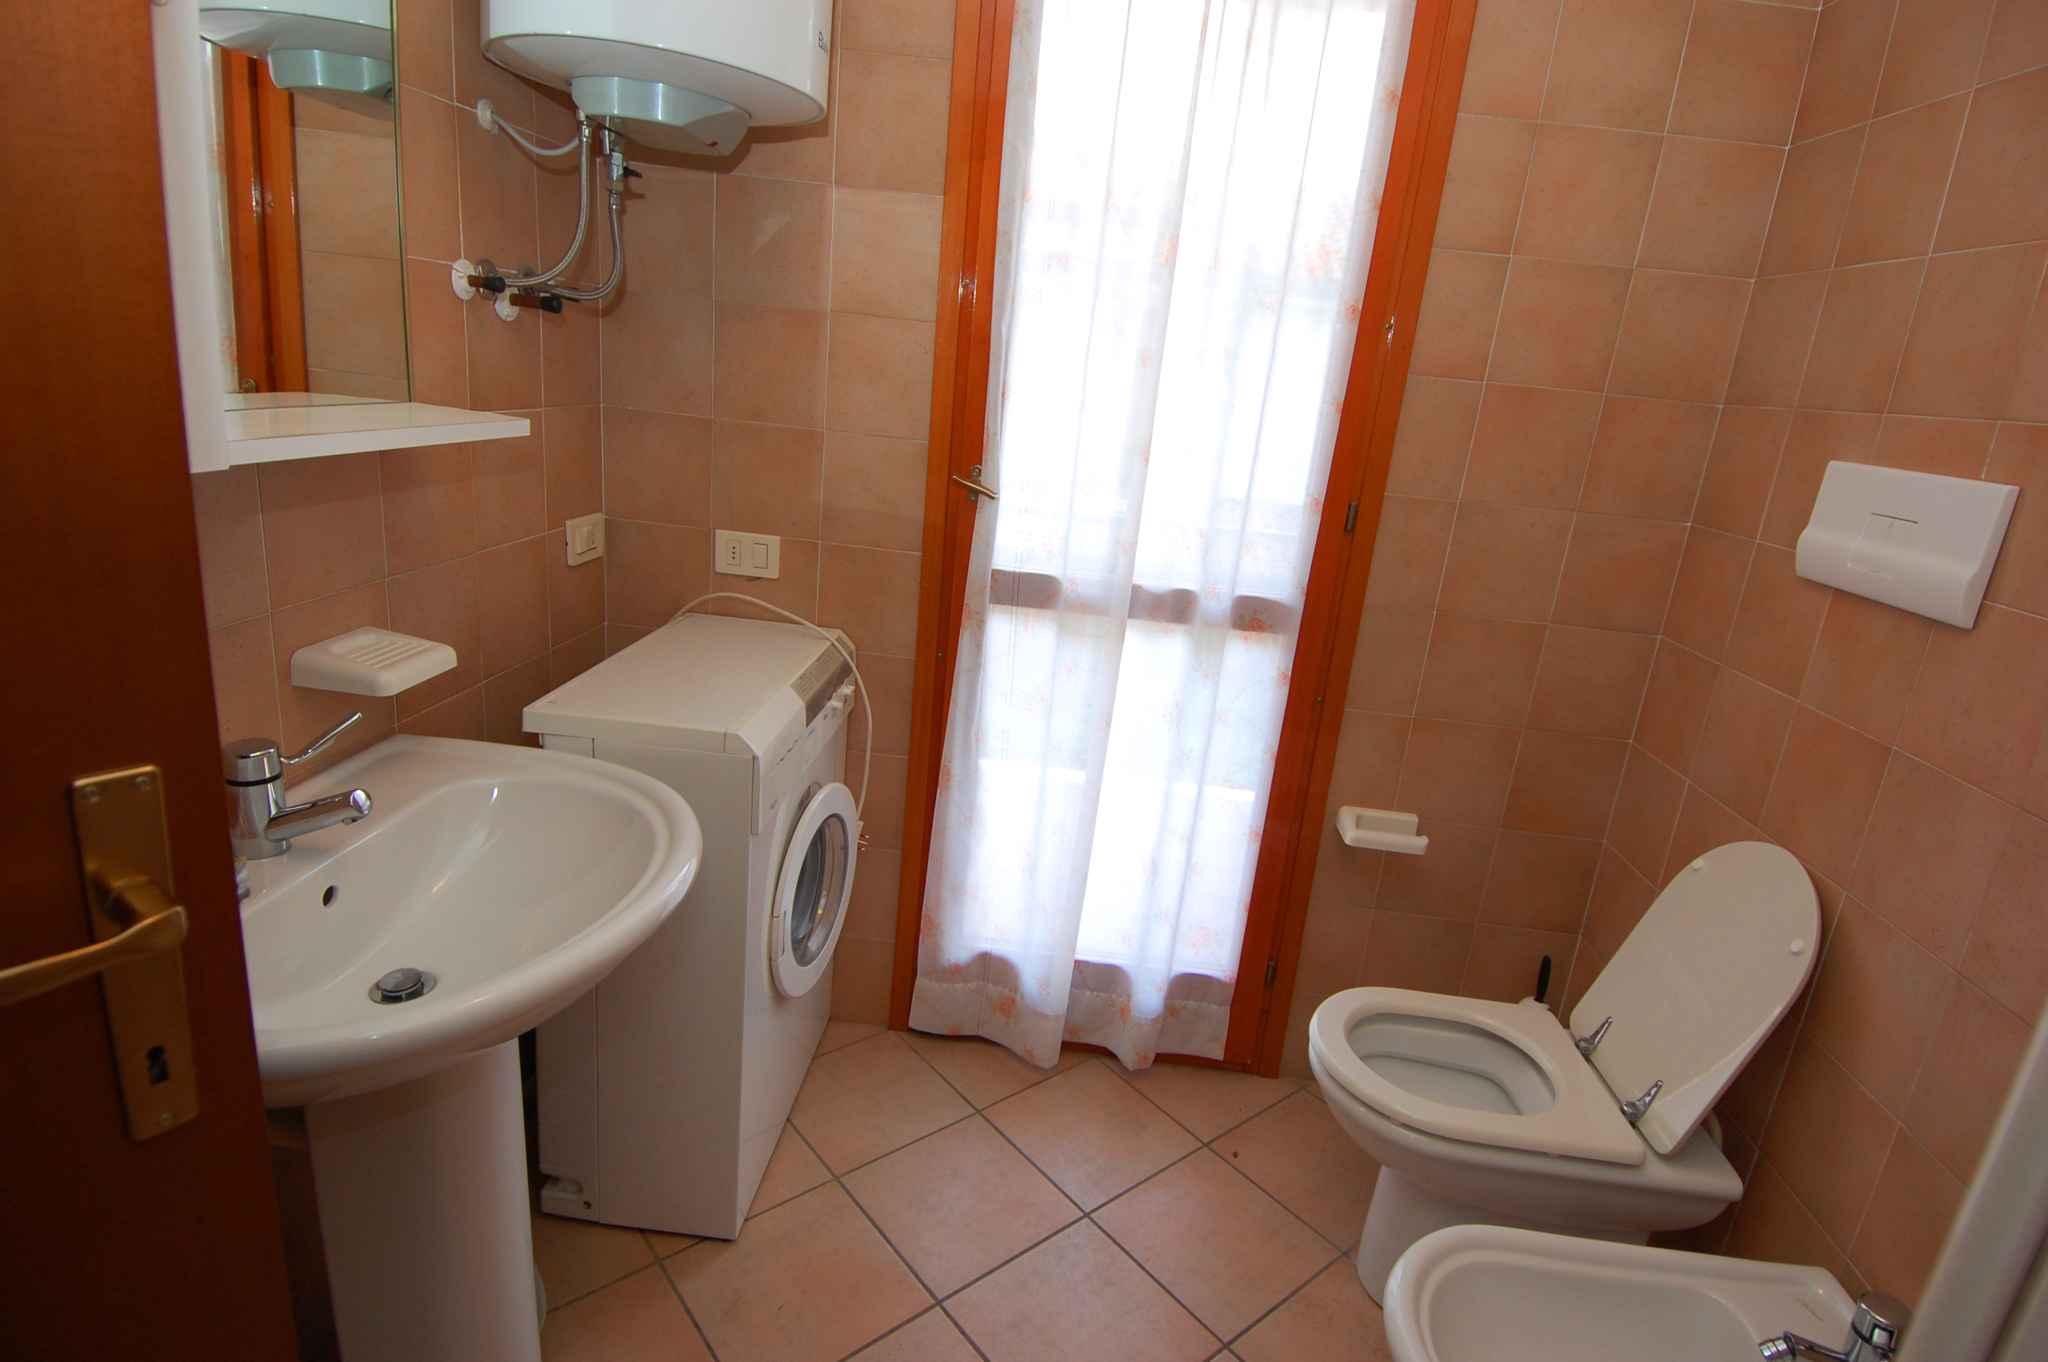 Ferienhaus mit Pool und Grill (284304), Rosolina Mare, Rovigo, Venetien, Italien, Bild 21